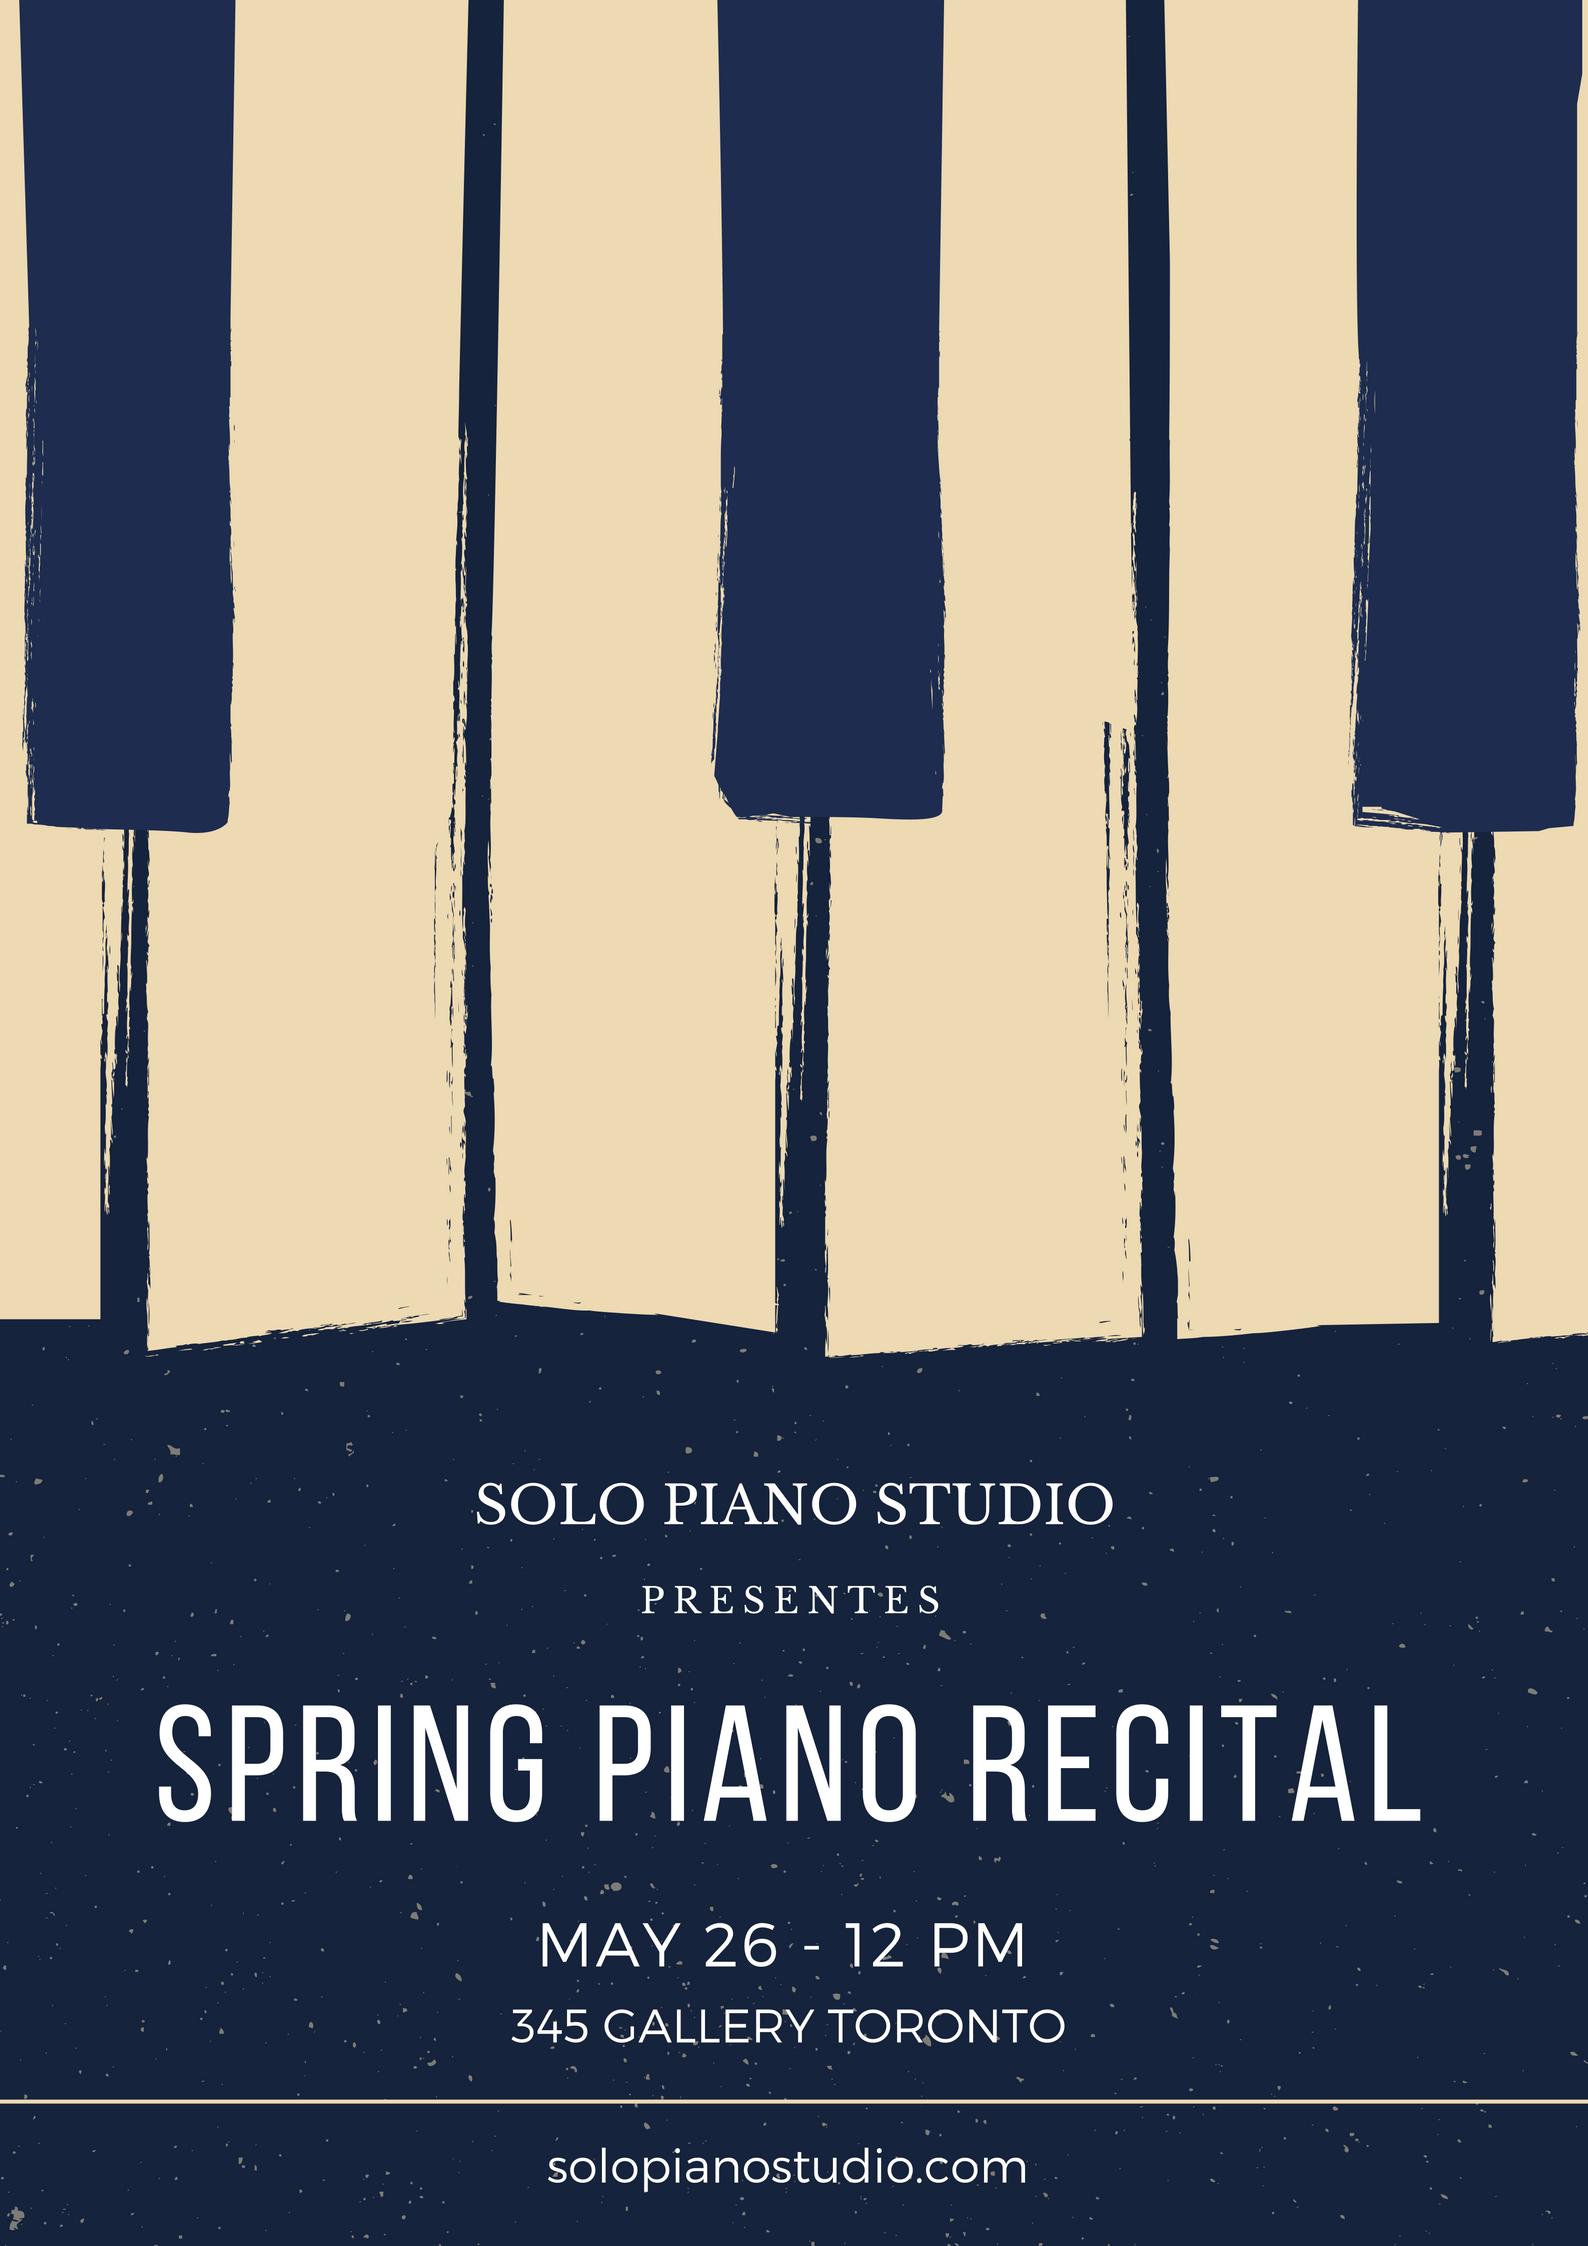 Spring Piano Recital Poster